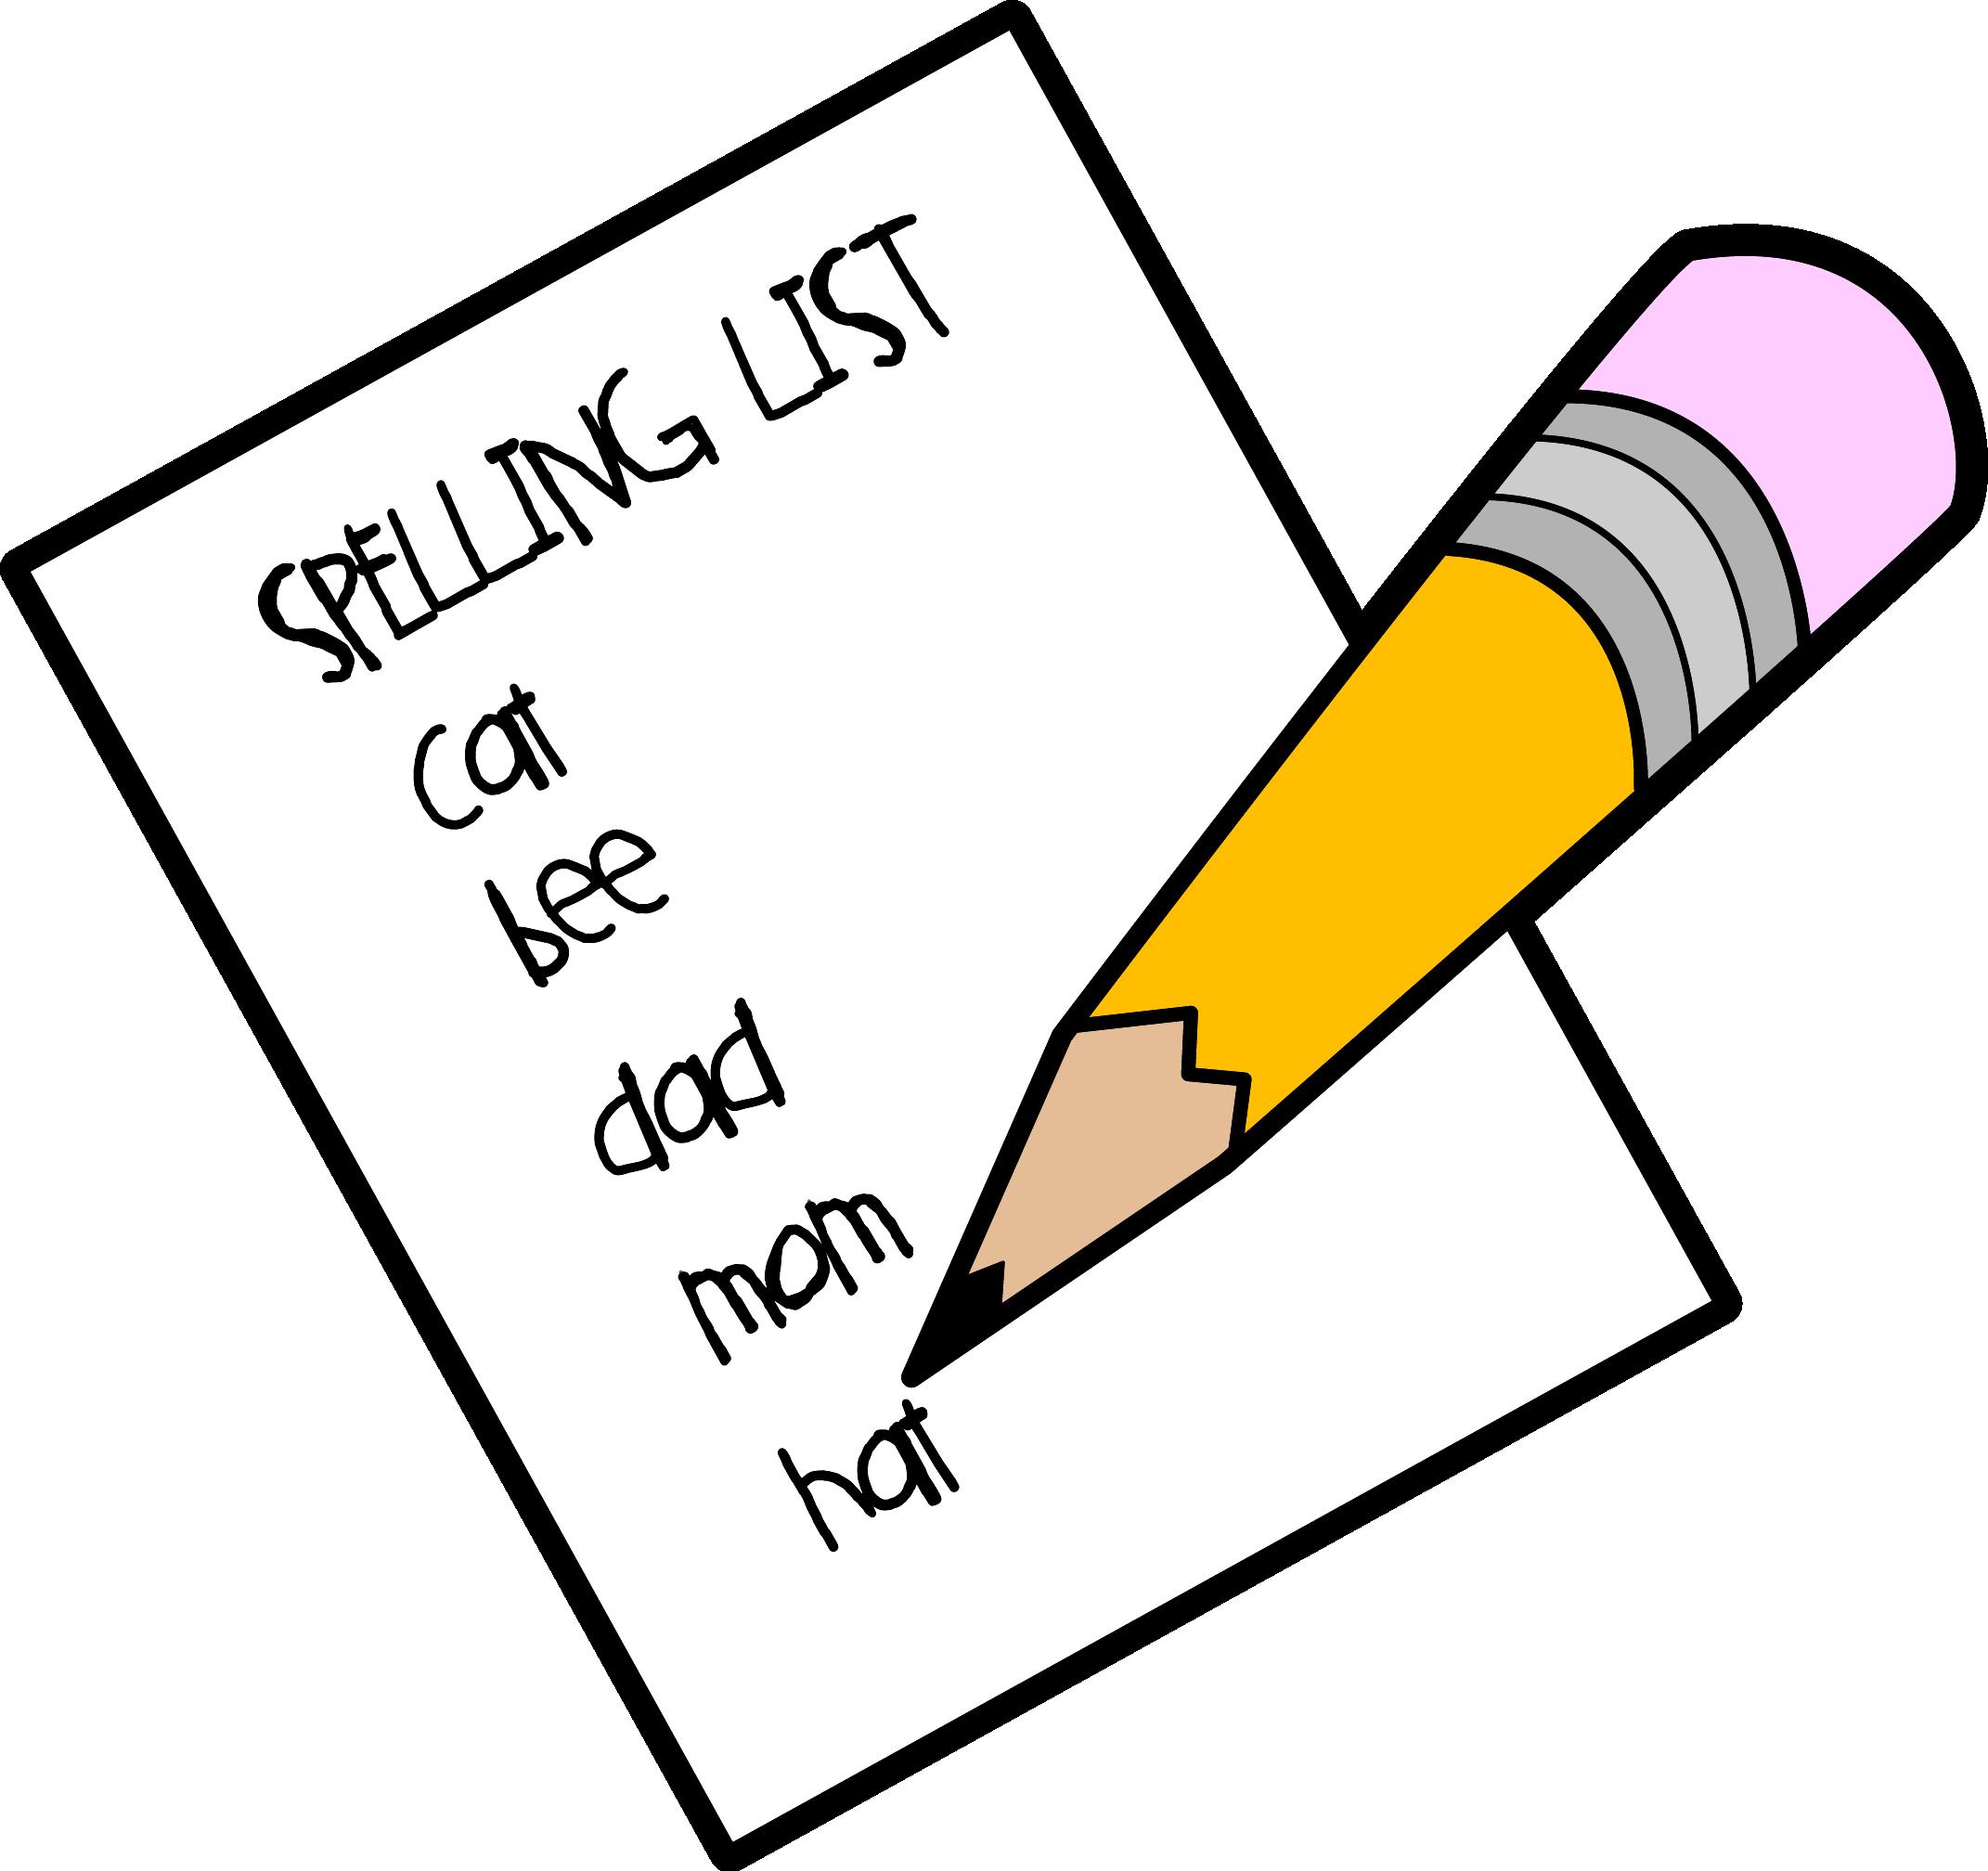 Notebook clipart spelling Spelling Pen spelling_list_c and tips